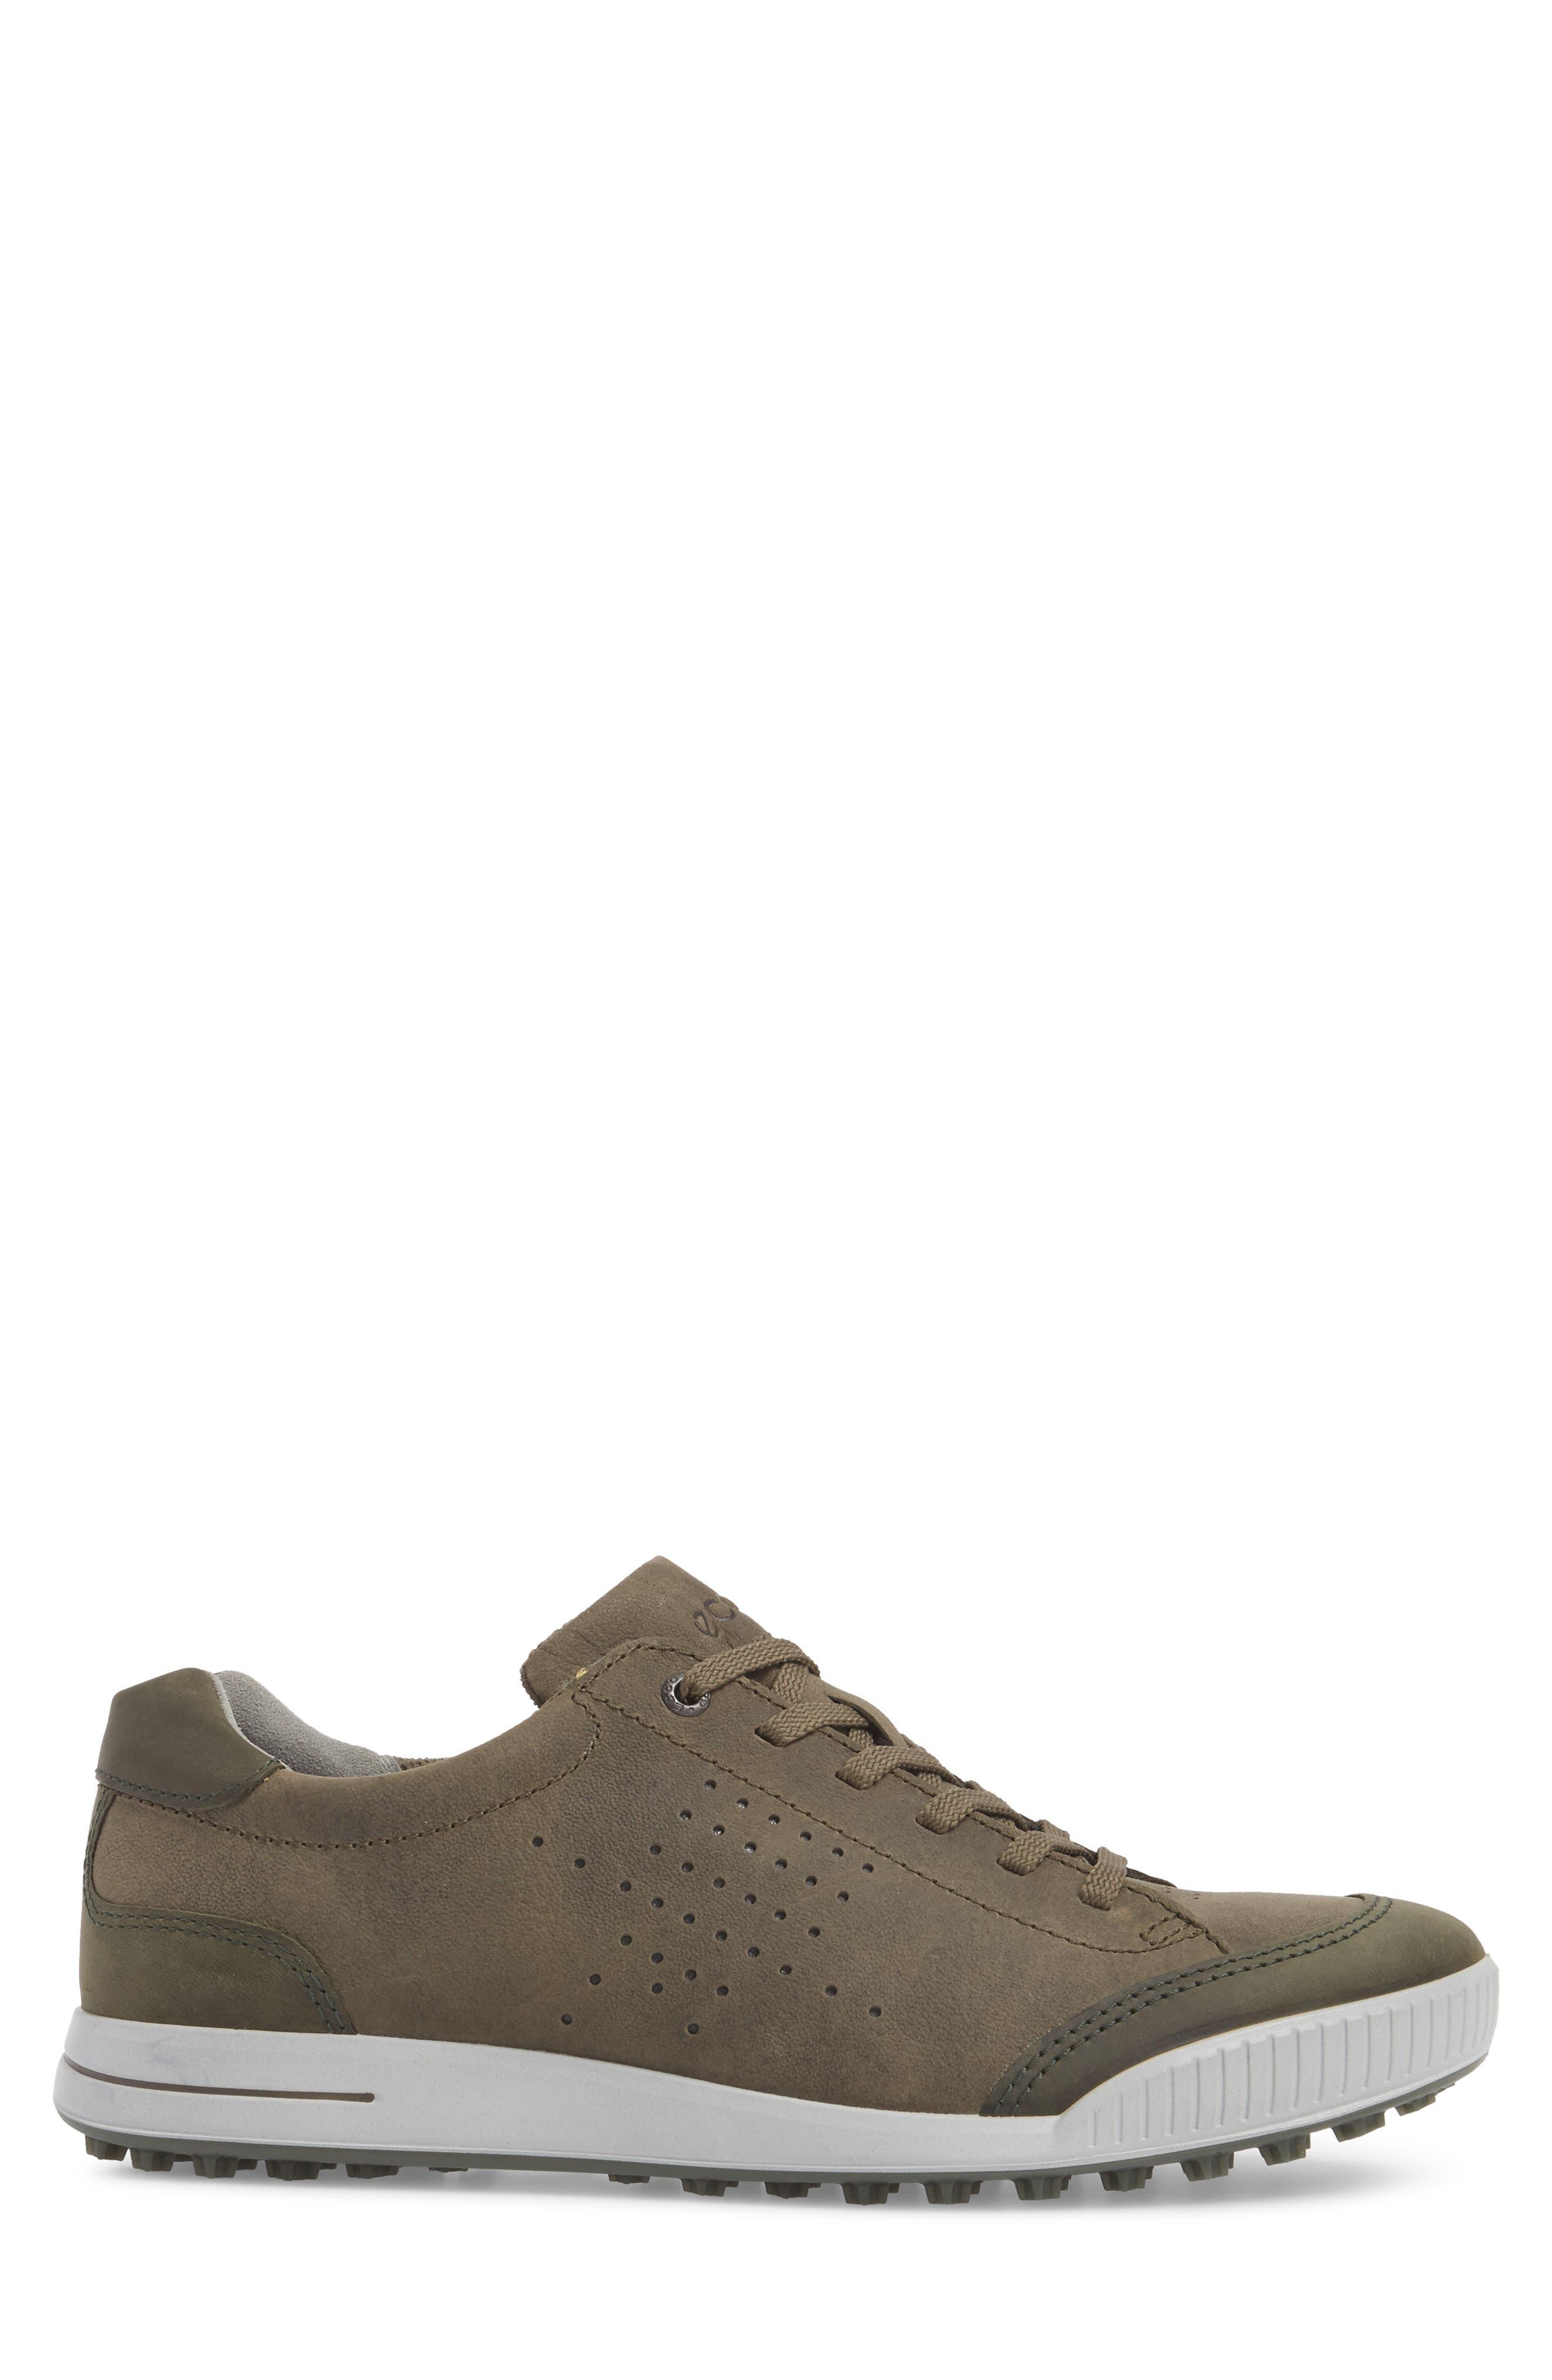 Street Retro HM Golf Shoe,                             Alternate thumbnail 3, color,                             Tarmac/ Deep Fore Leather